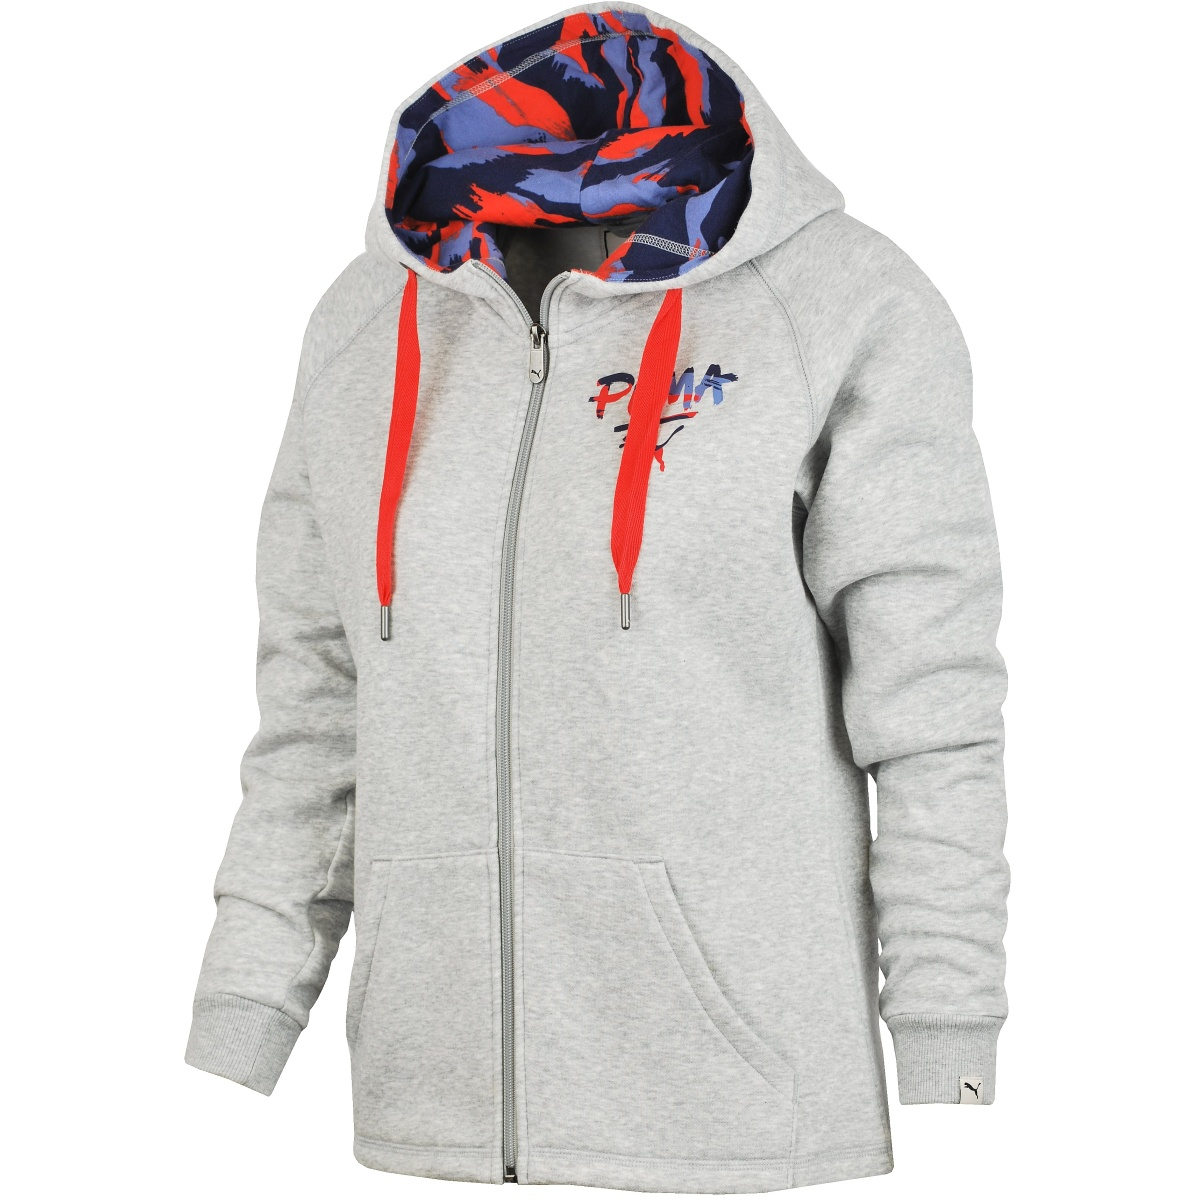 Puma FUN Hooded Sweat Jkt Fl W šedá S - Glami.cz 0af6df9fe1d